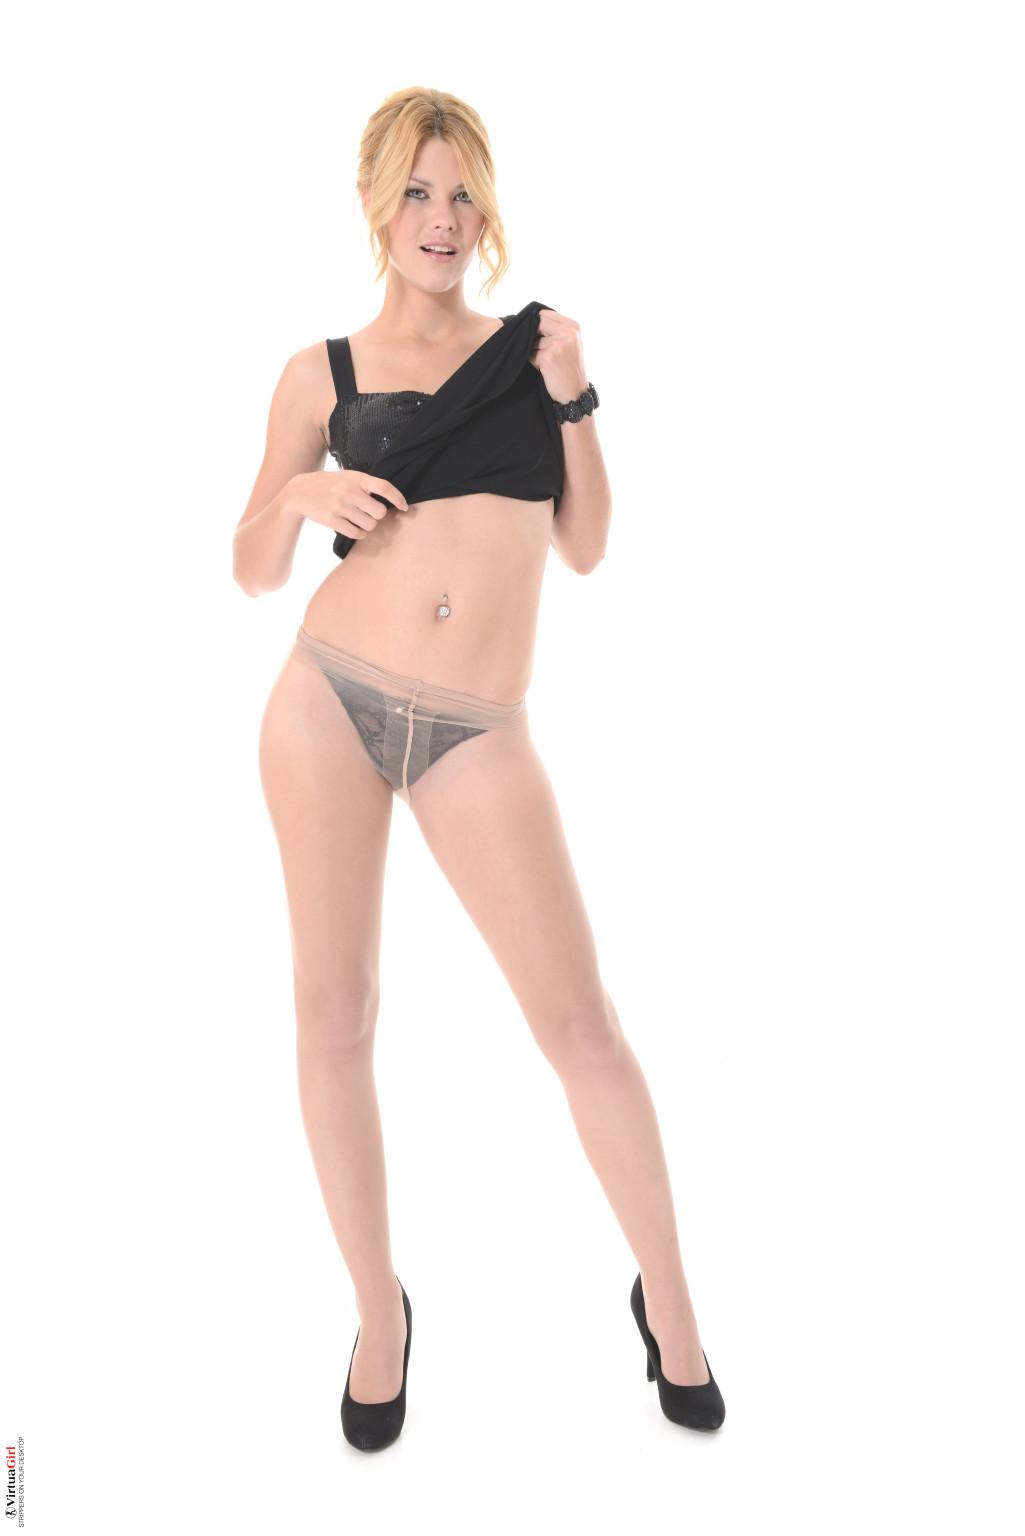 Izzy Delphine, Jenny Anne - Фигуристые женщины - Галерея № 3503678